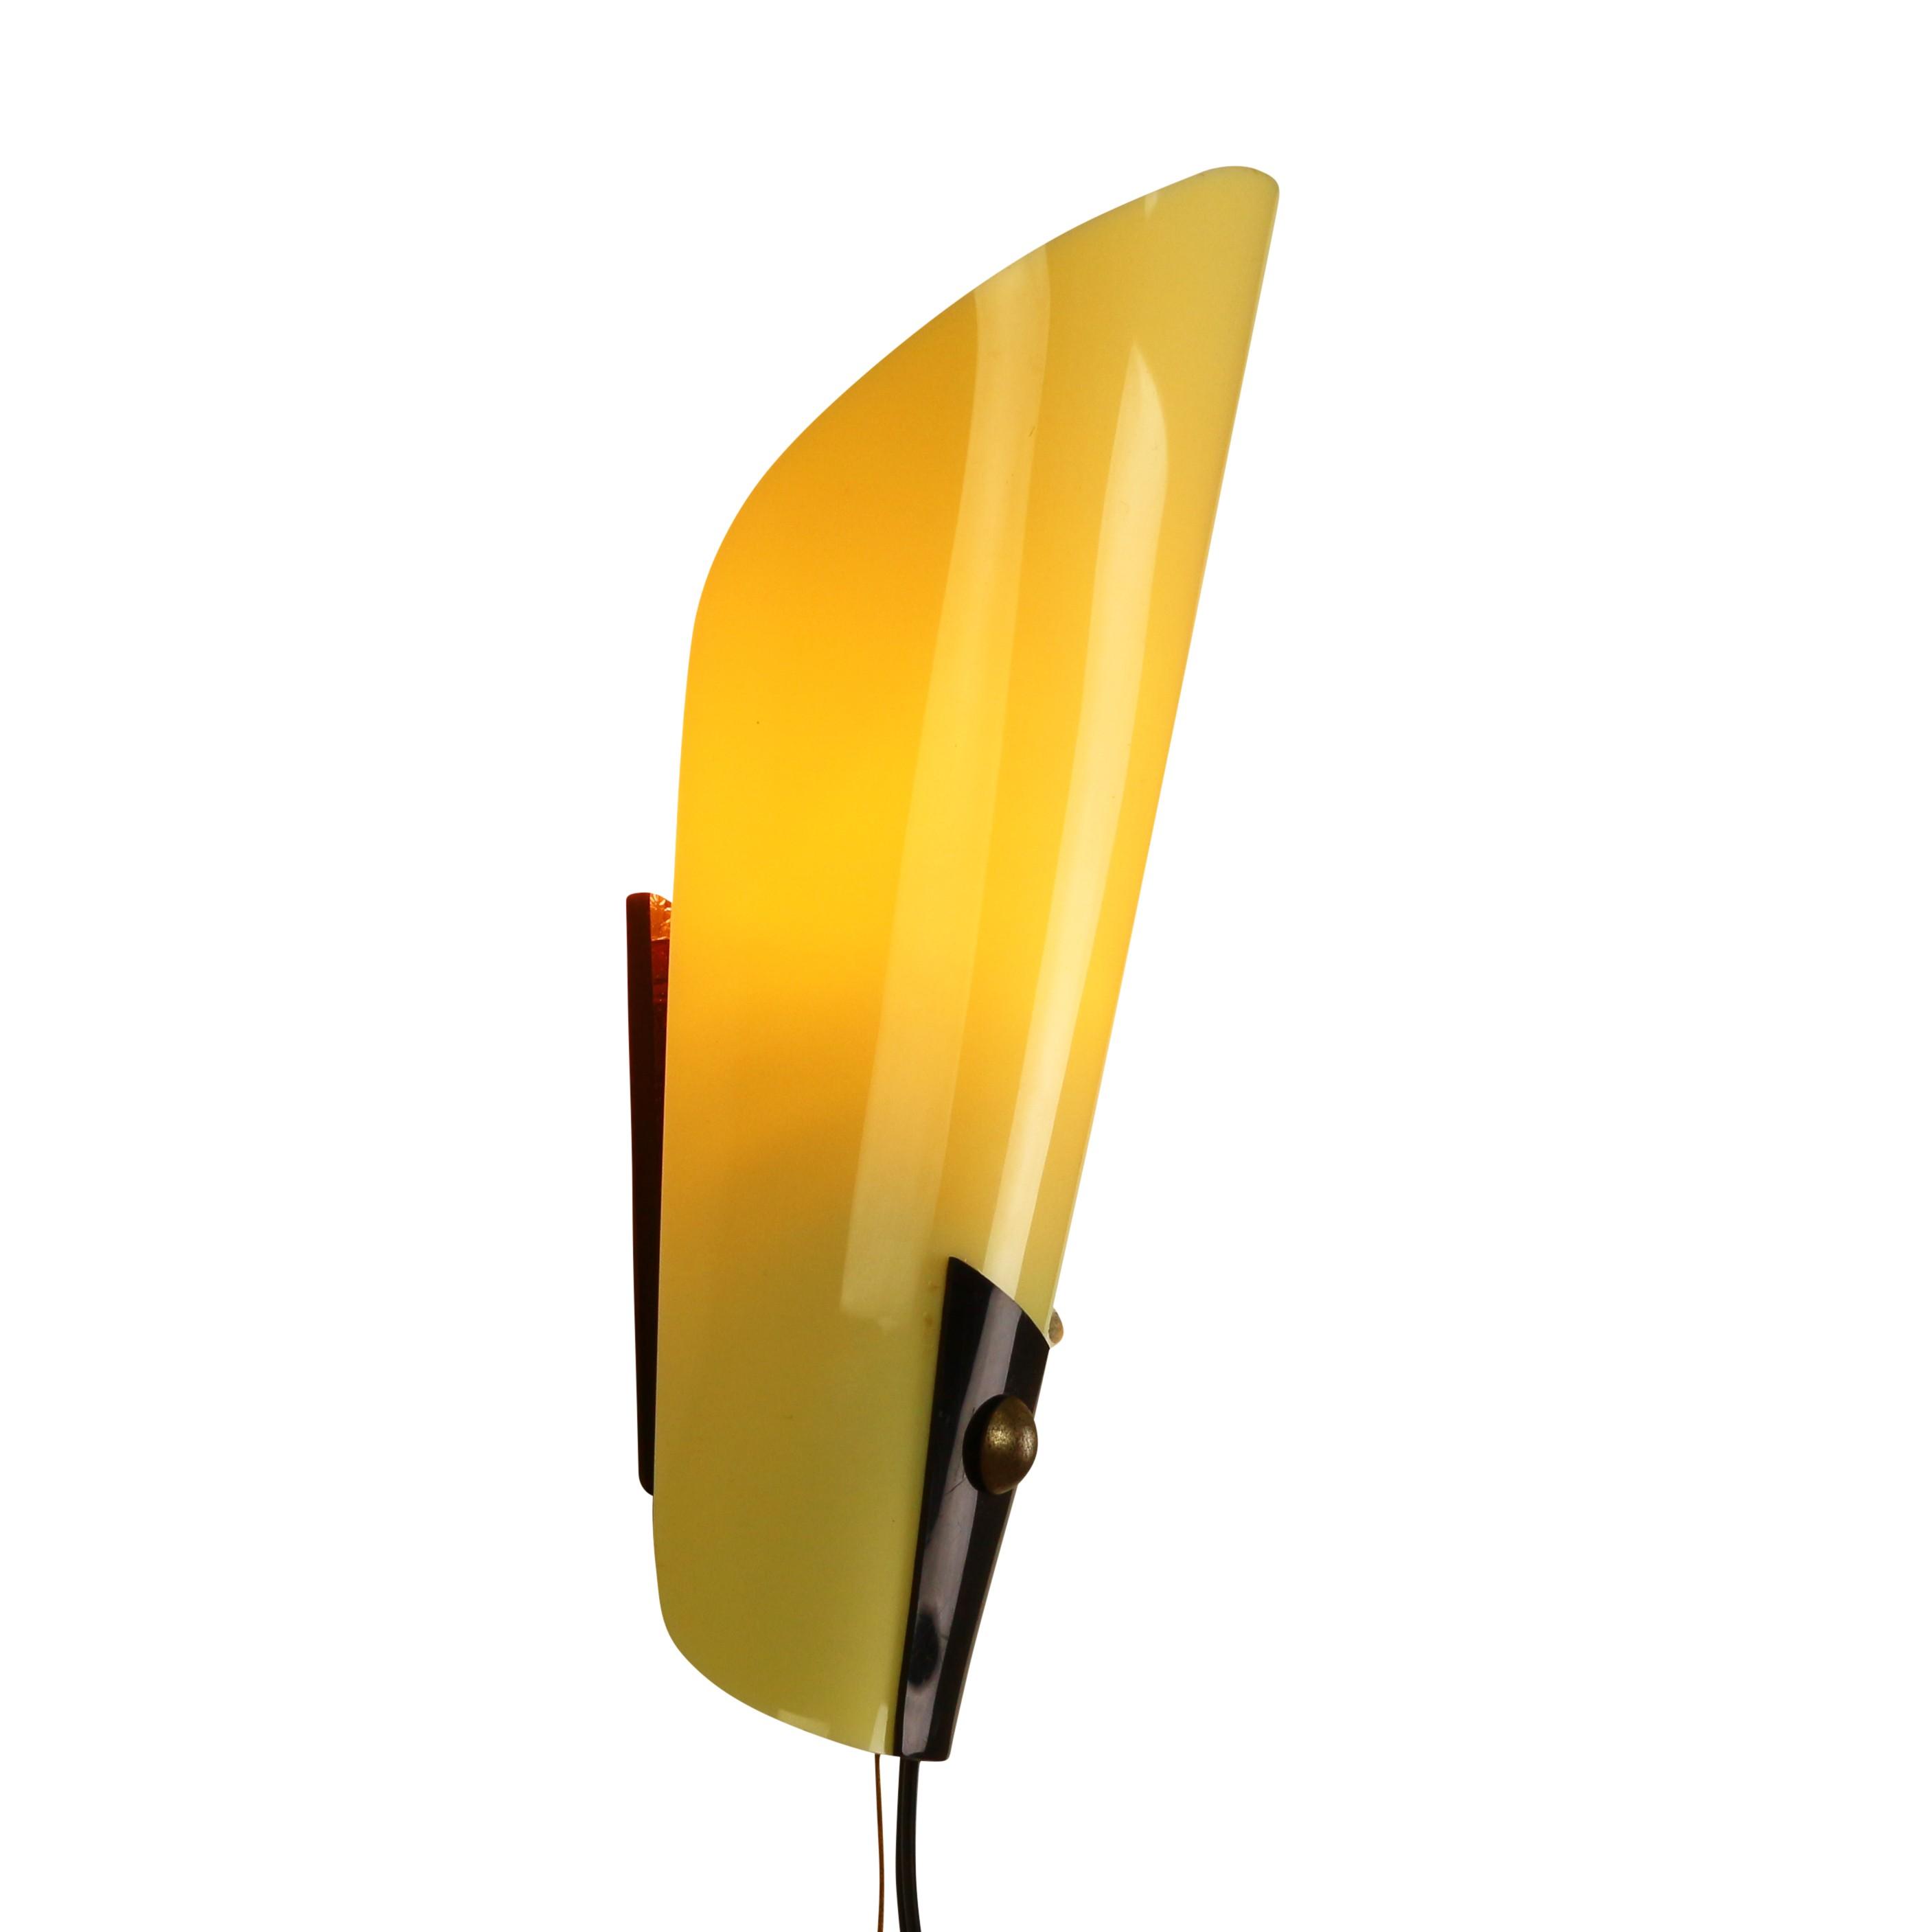 Art deco yellow plastics wall light - 1950s - Design Market